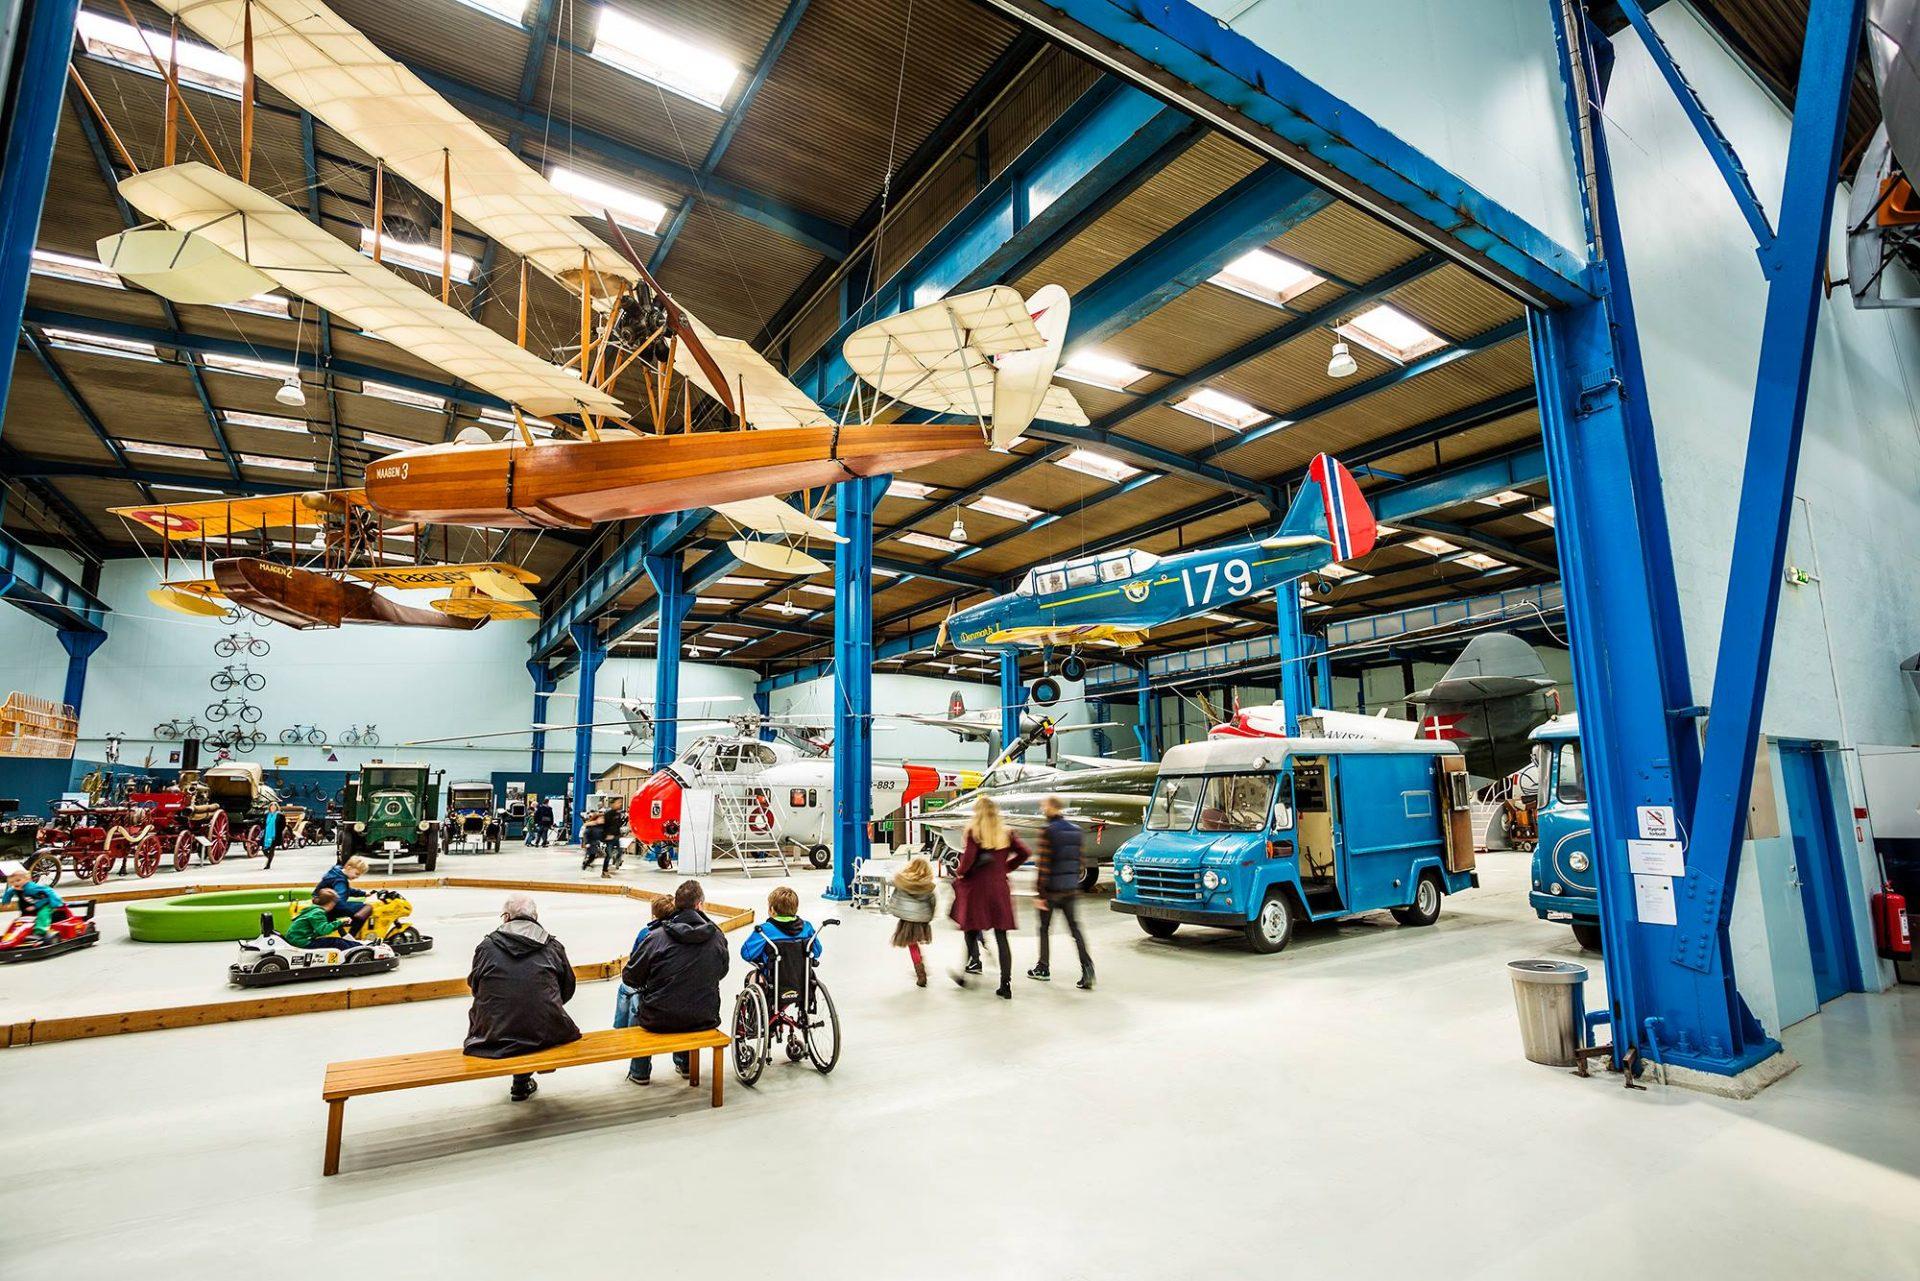 Danmarks Tekniske Museum